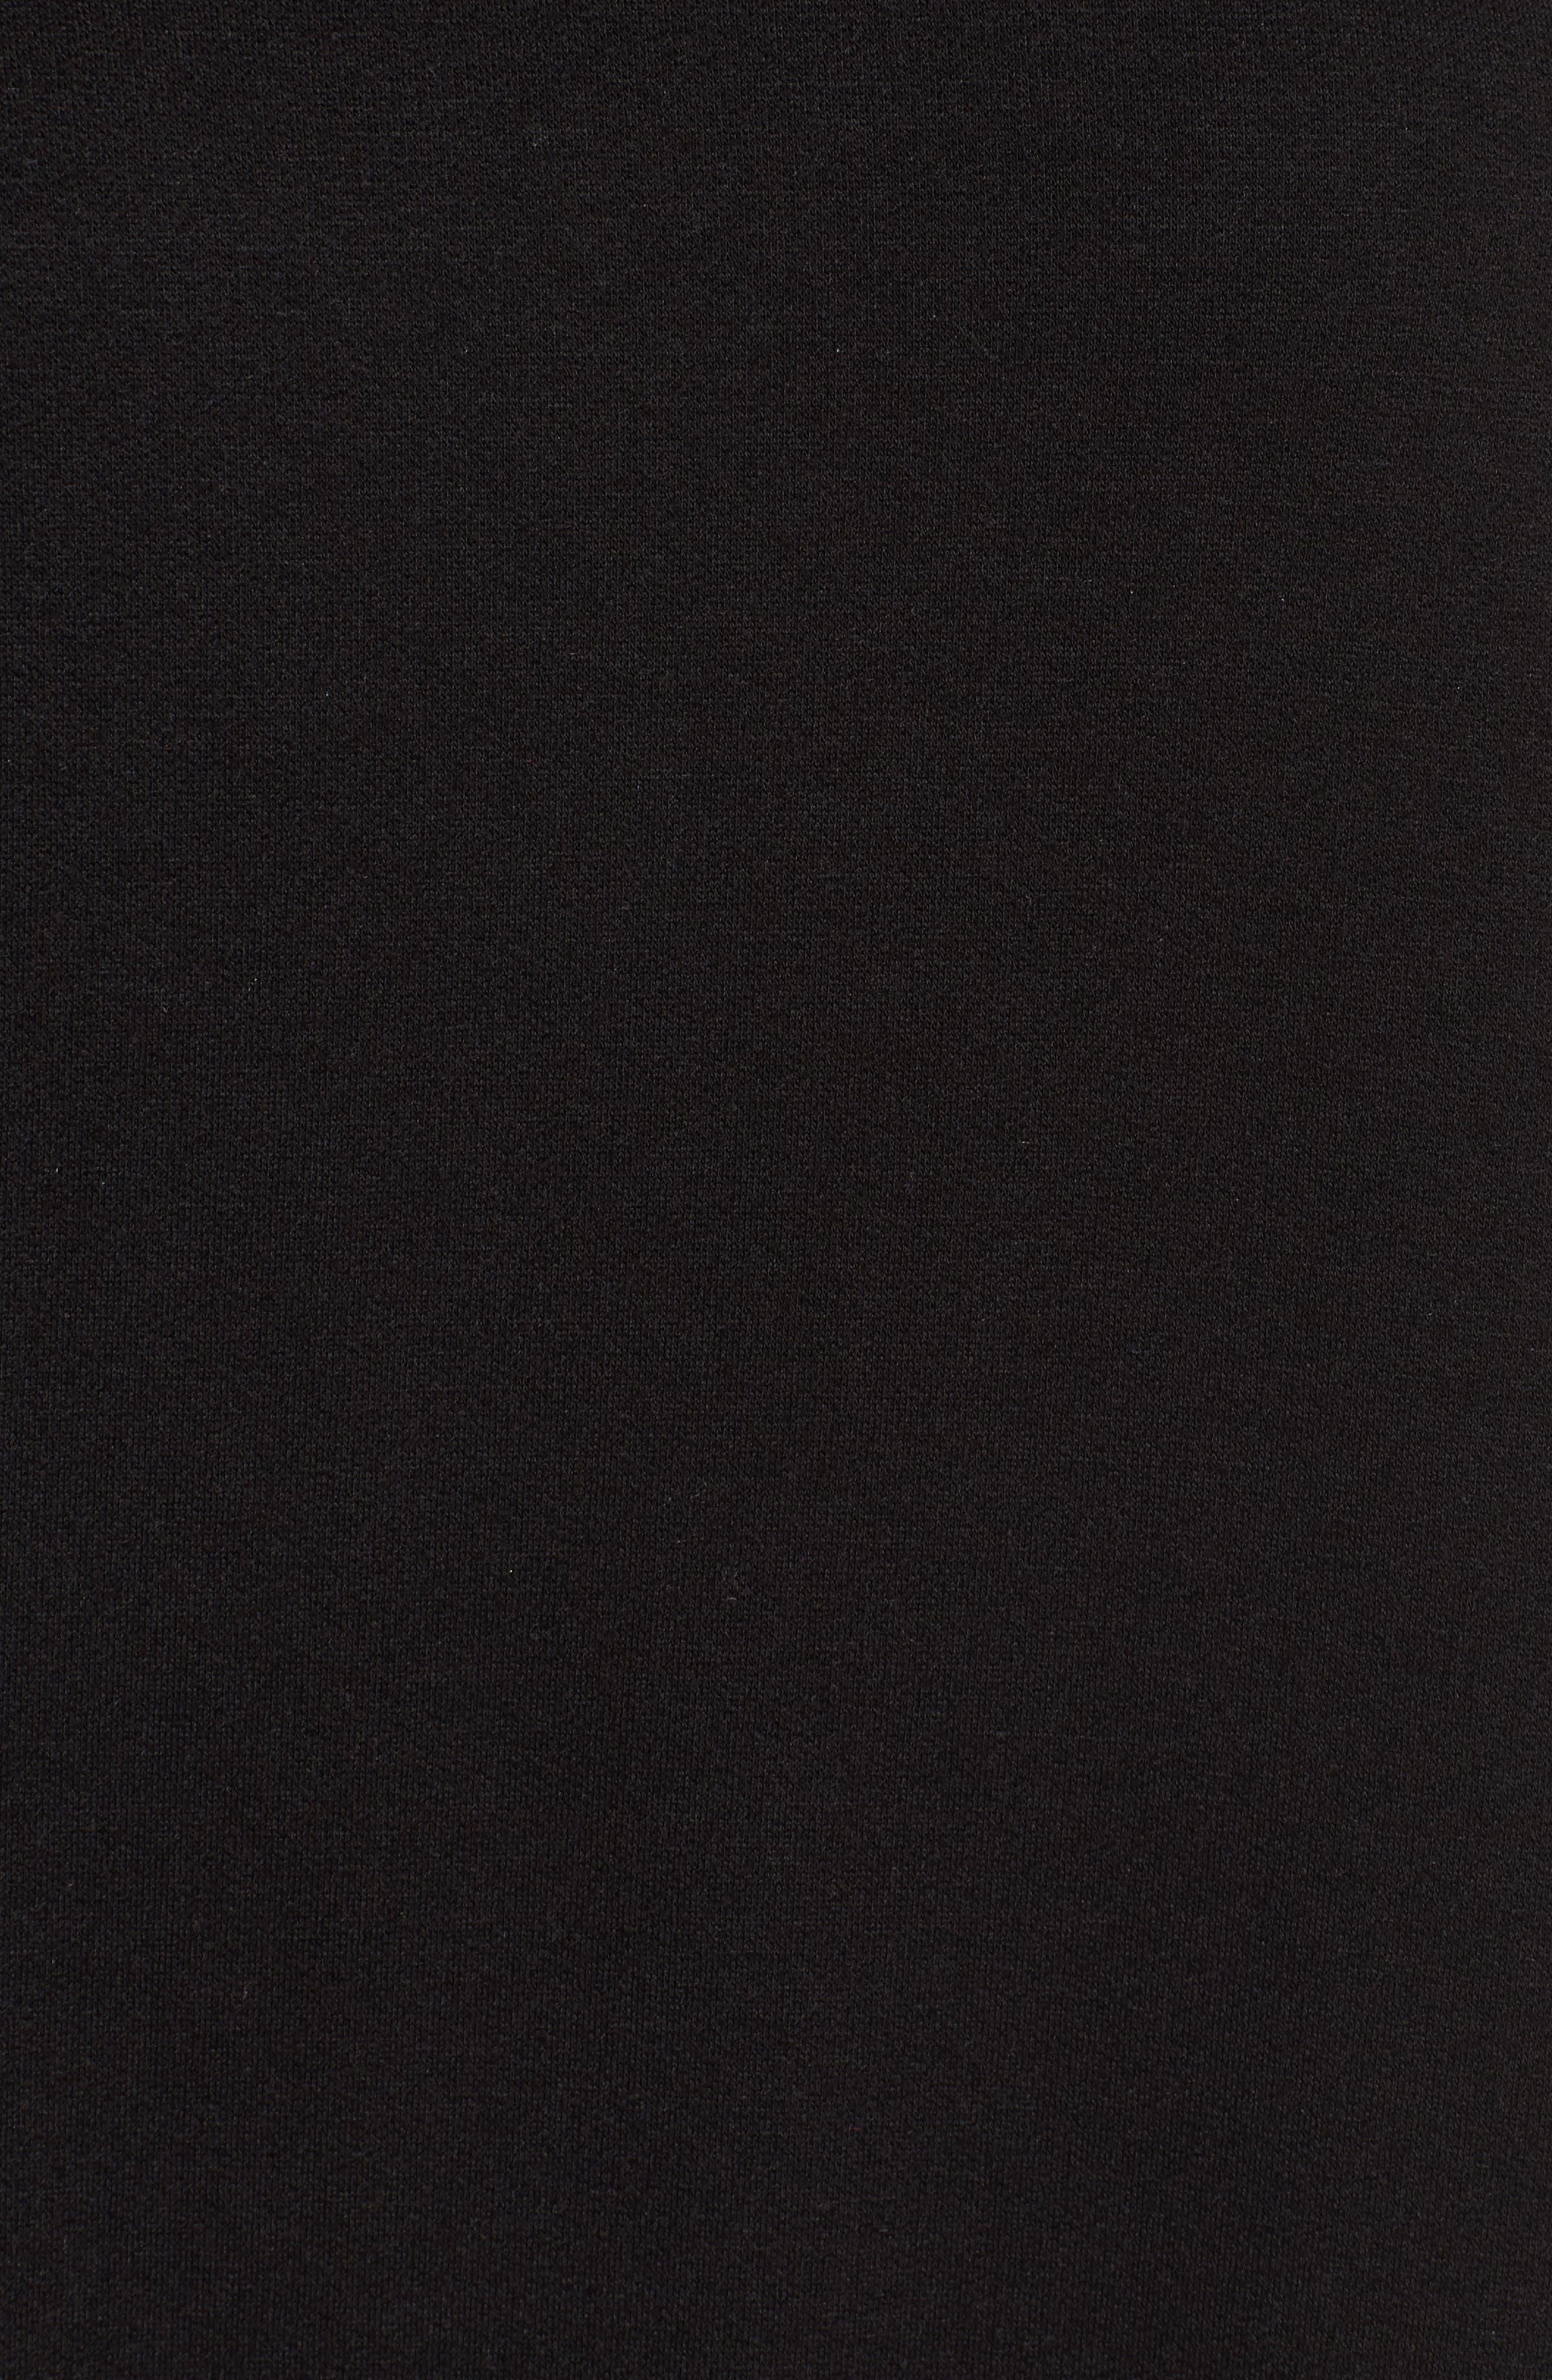 Brushed Jersey Poncho,                             Alternate thumbnail 6, color,                             Black